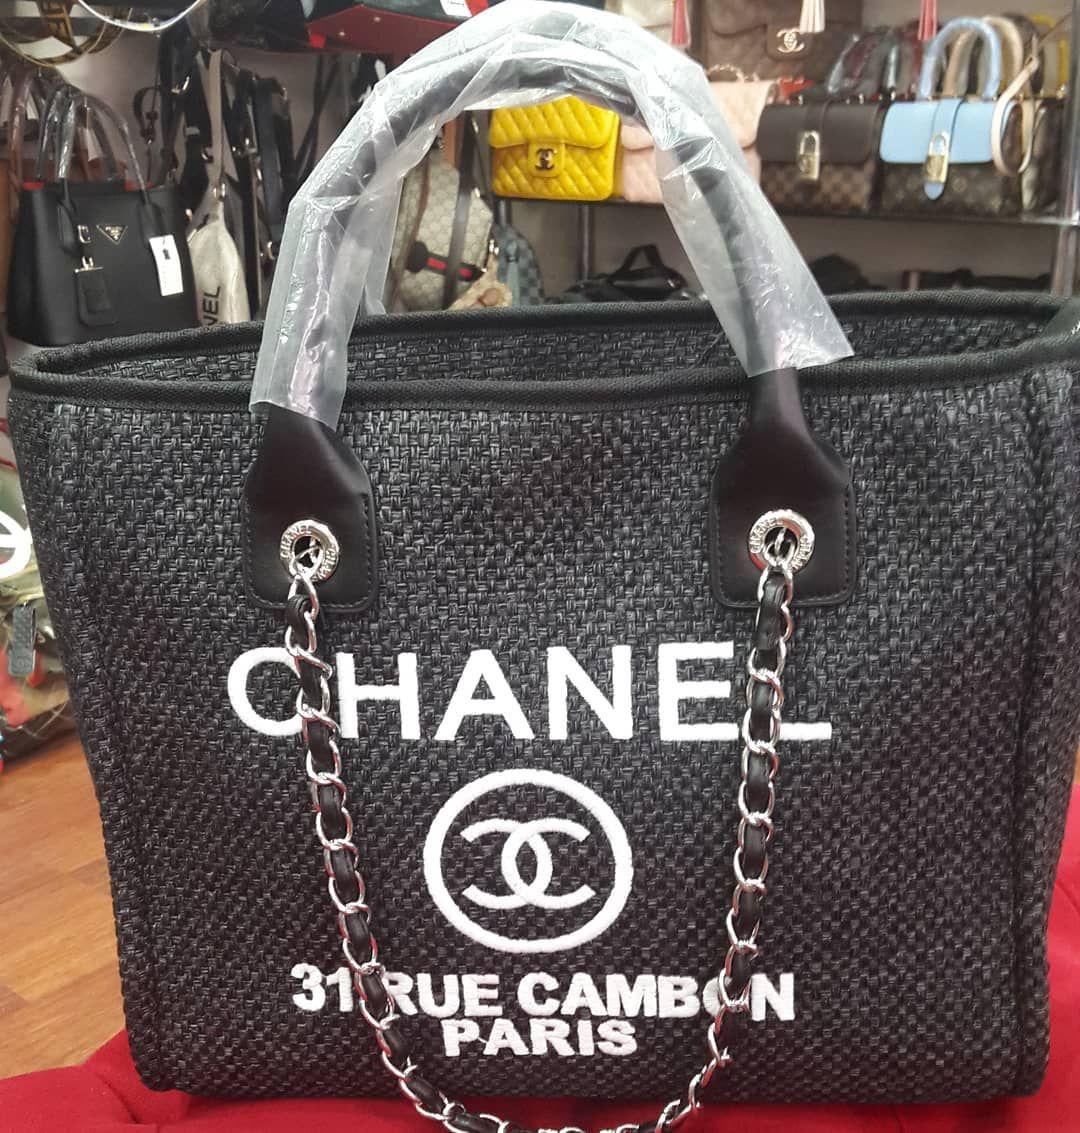 Chanel Canta Cantamodelleri Kadin Bayan Istanbul Ankara Bursa Izmir Kocaeli Gebze Sakarya Chanel Deauville Tote Bag Tote Bag Bags